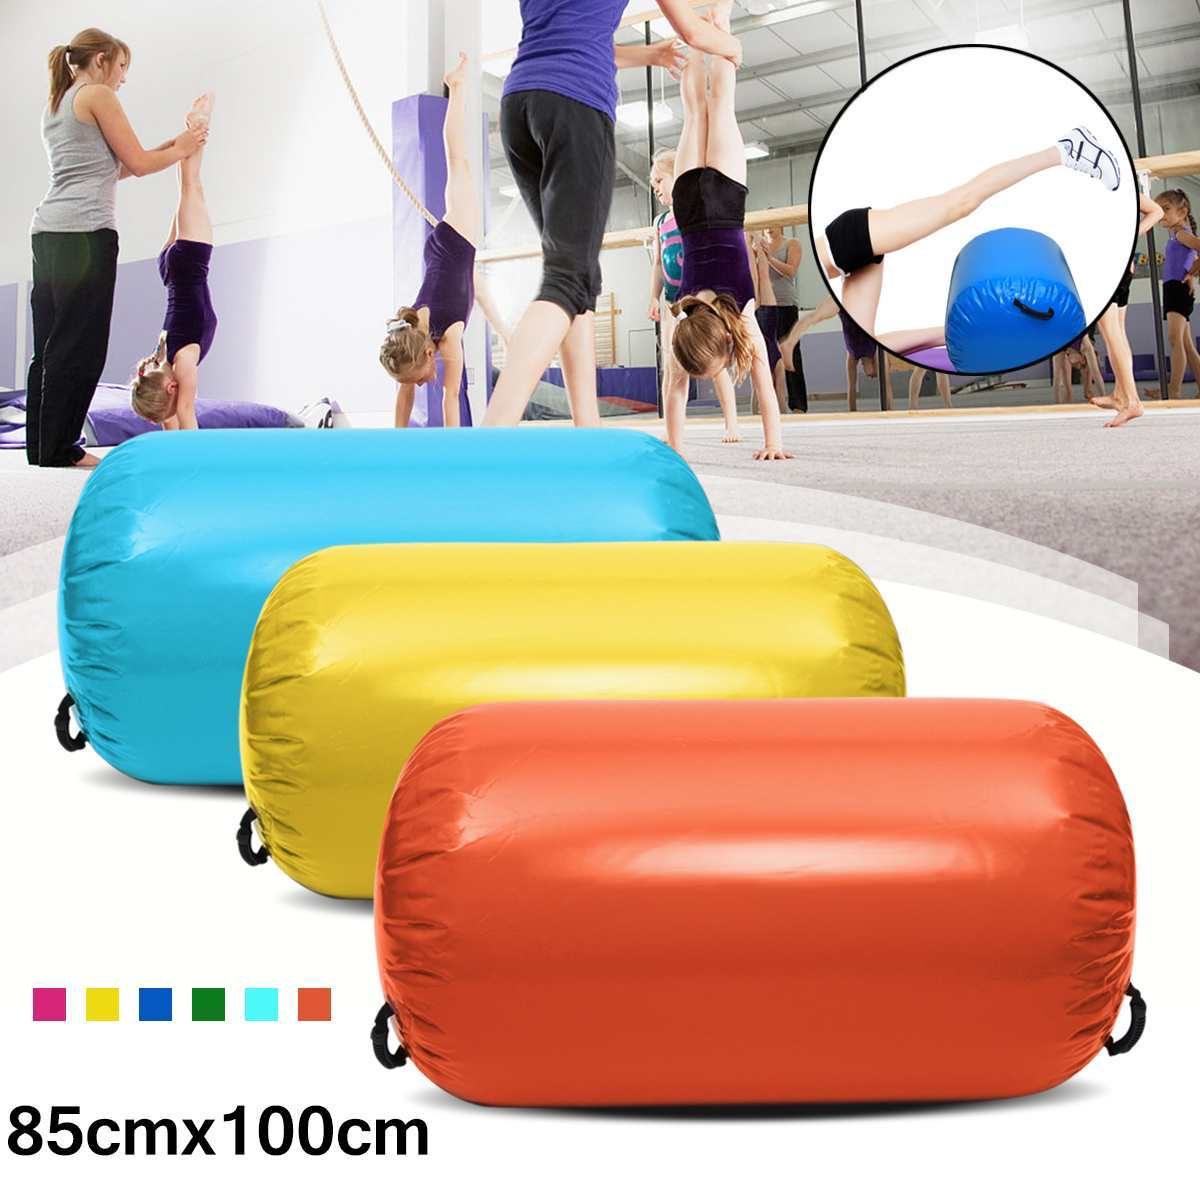 85x100cm Airtrack Inflatable Gymnastics Gym Air Mat Floor Home Gymnastics Exercise Inverted Backflip Round Column Tumbling